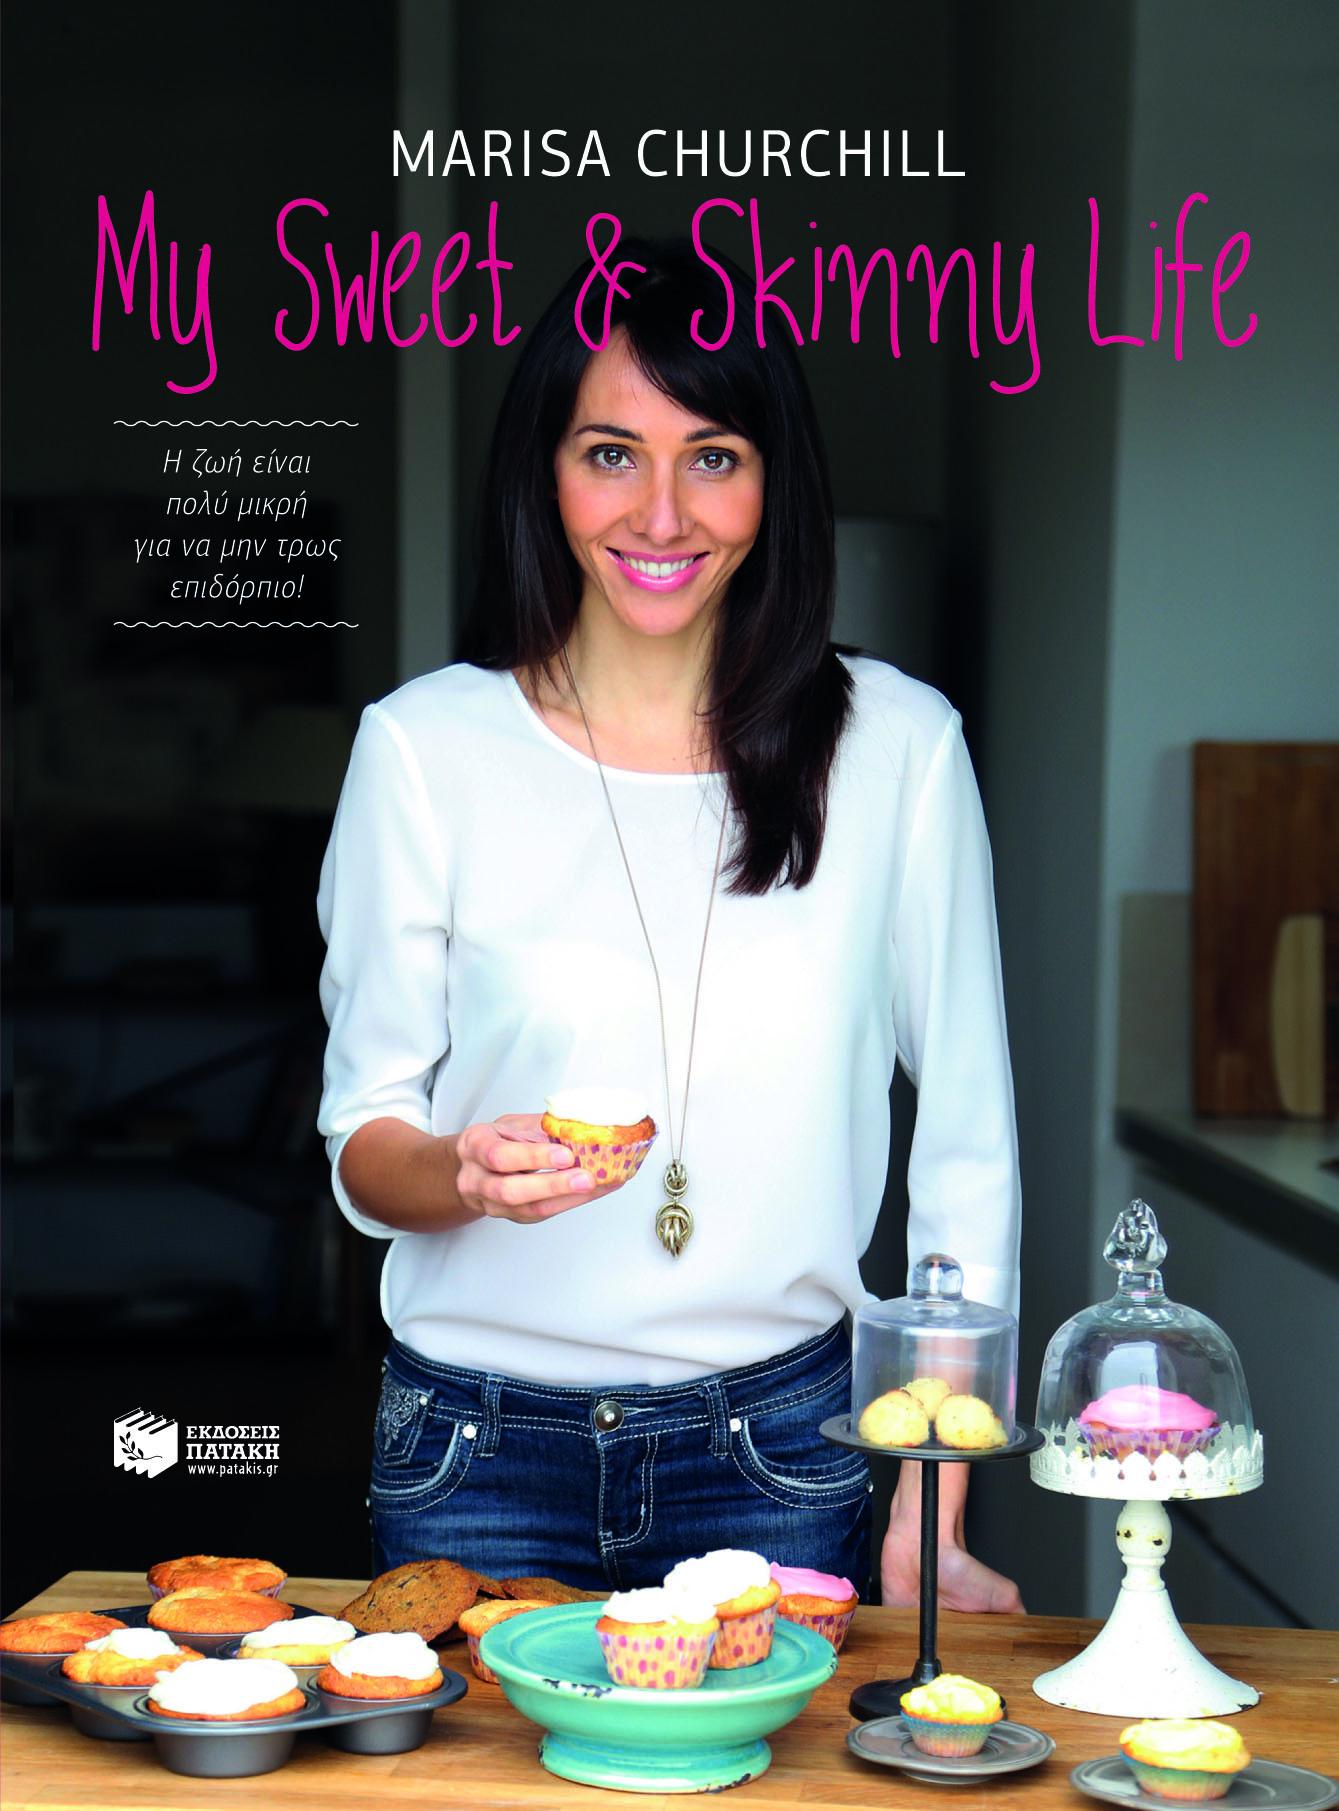 My Sweet & Skinny Life